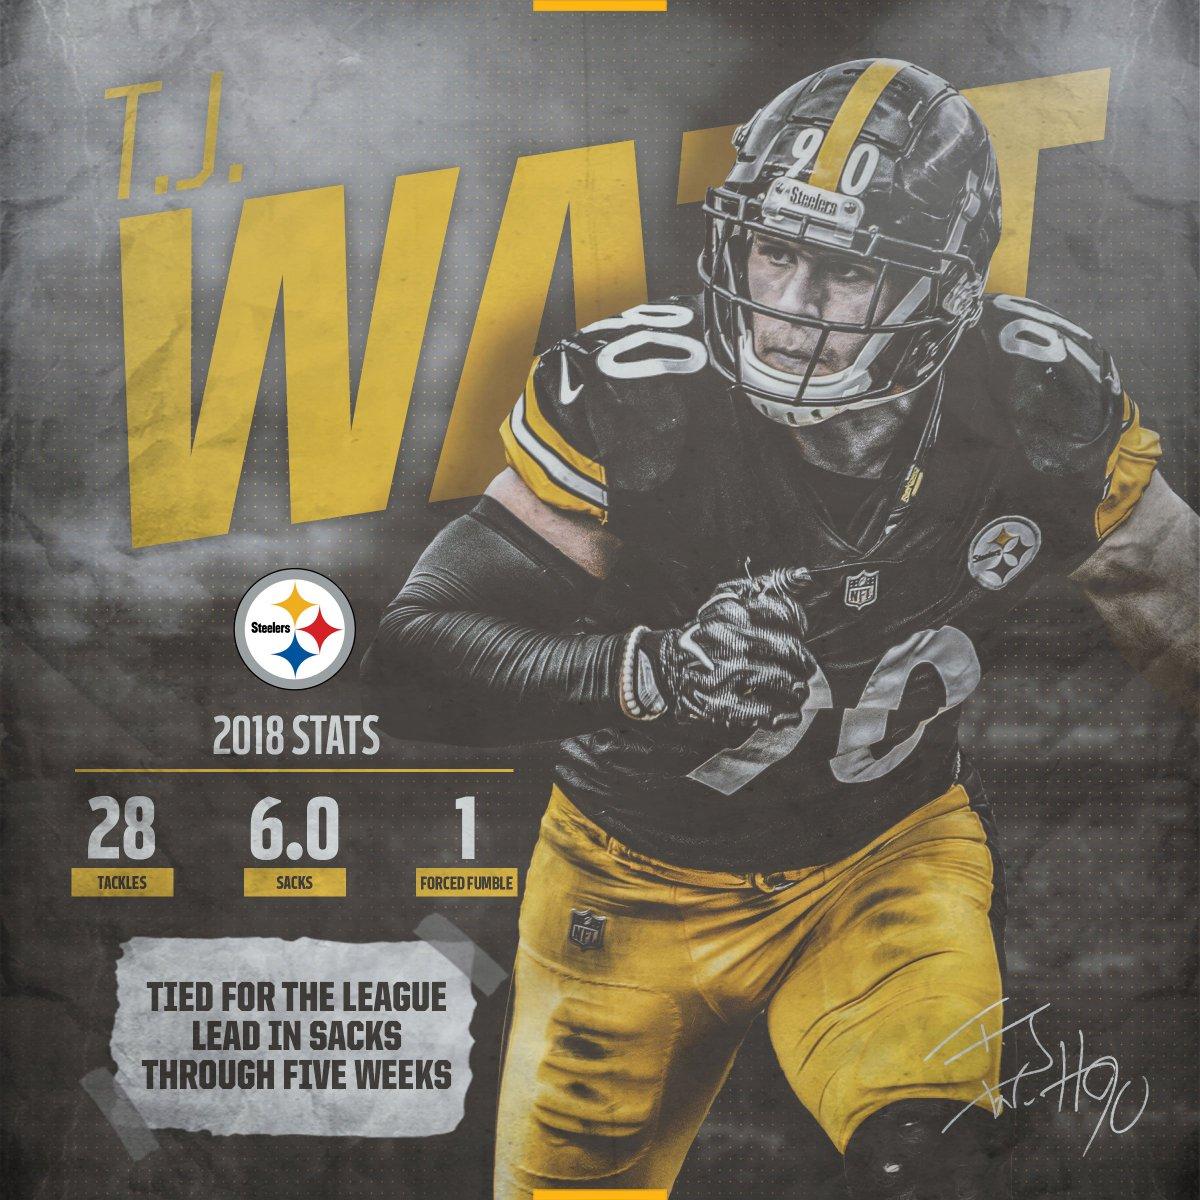 69b54470539 Pittsburgh Steelers on Twitter